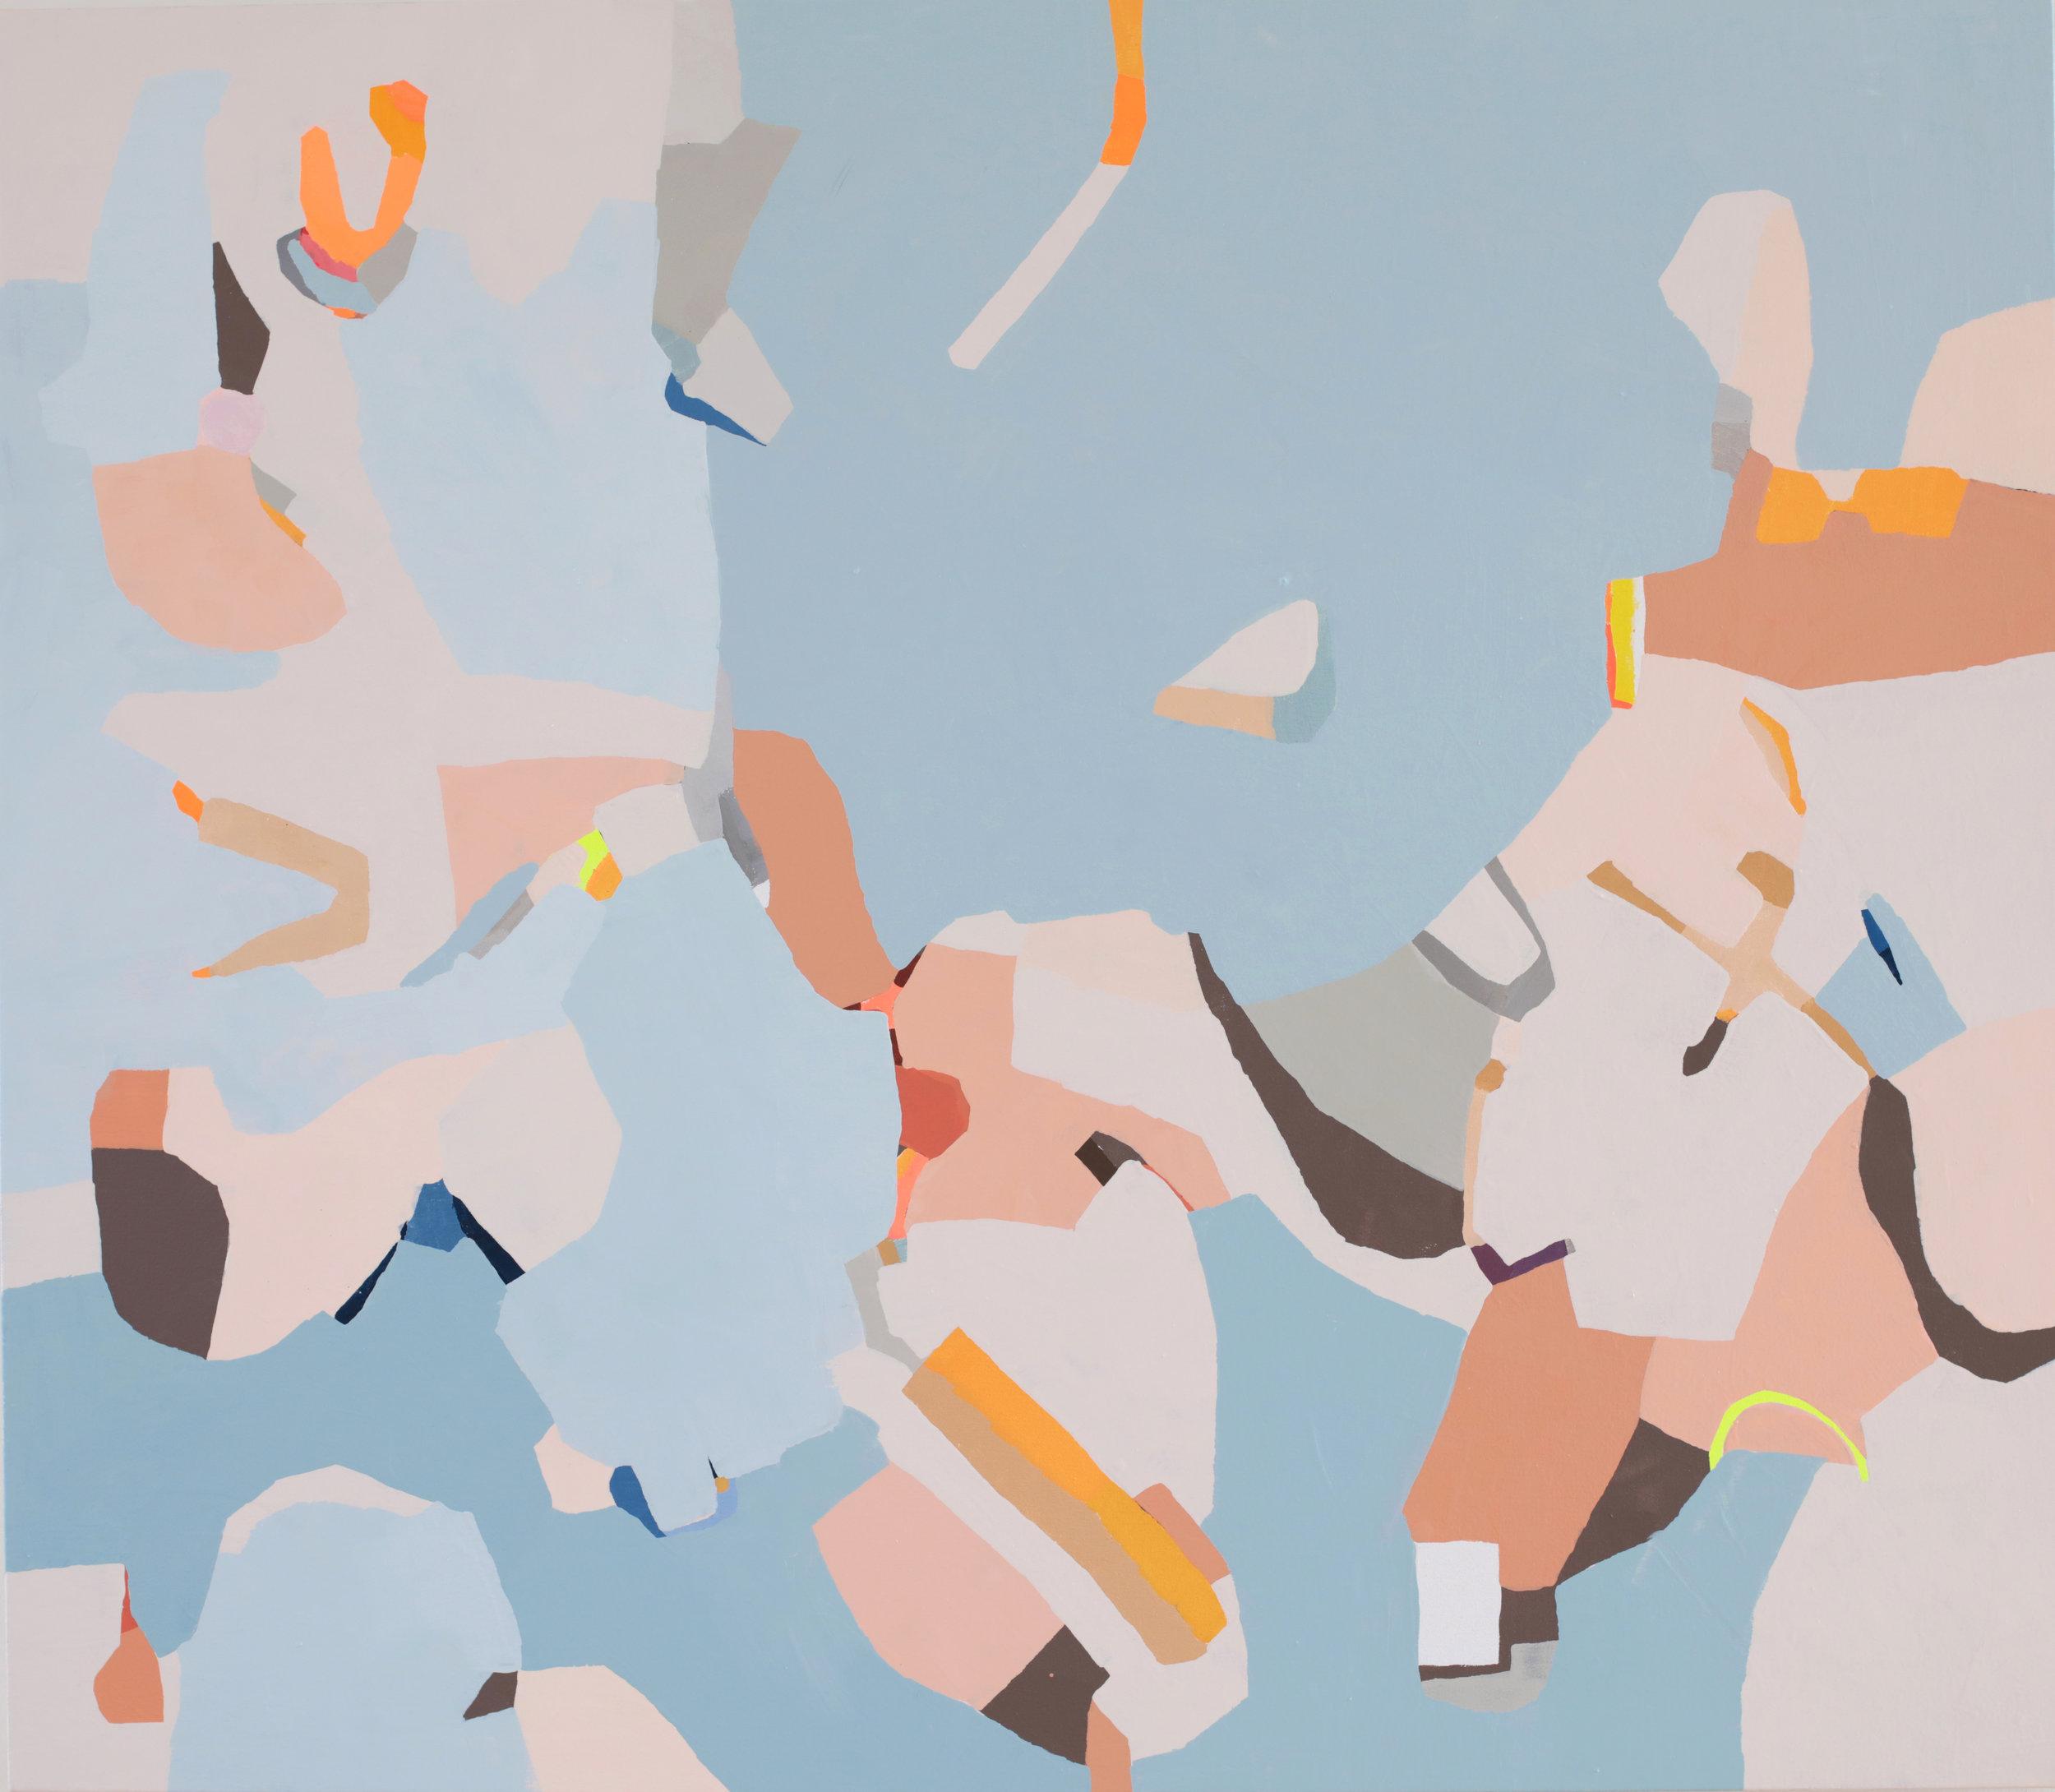 Intercoastal, 2018, oil on canvas 48x40 inches